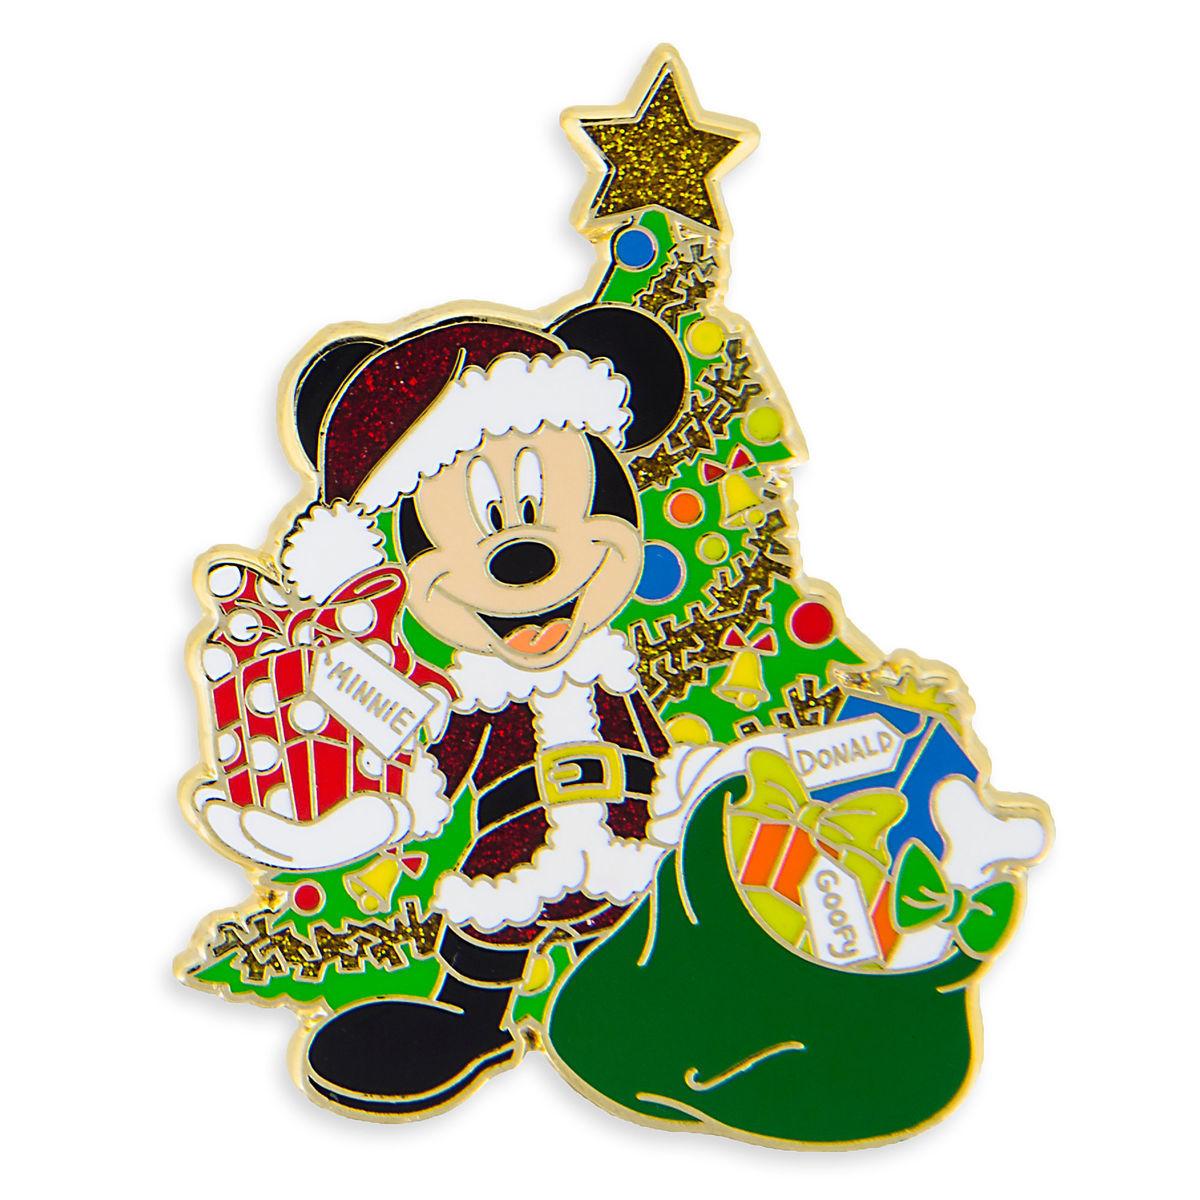 Disney Holiday Pin - Santa Mickey Mouse with Christmas Tree